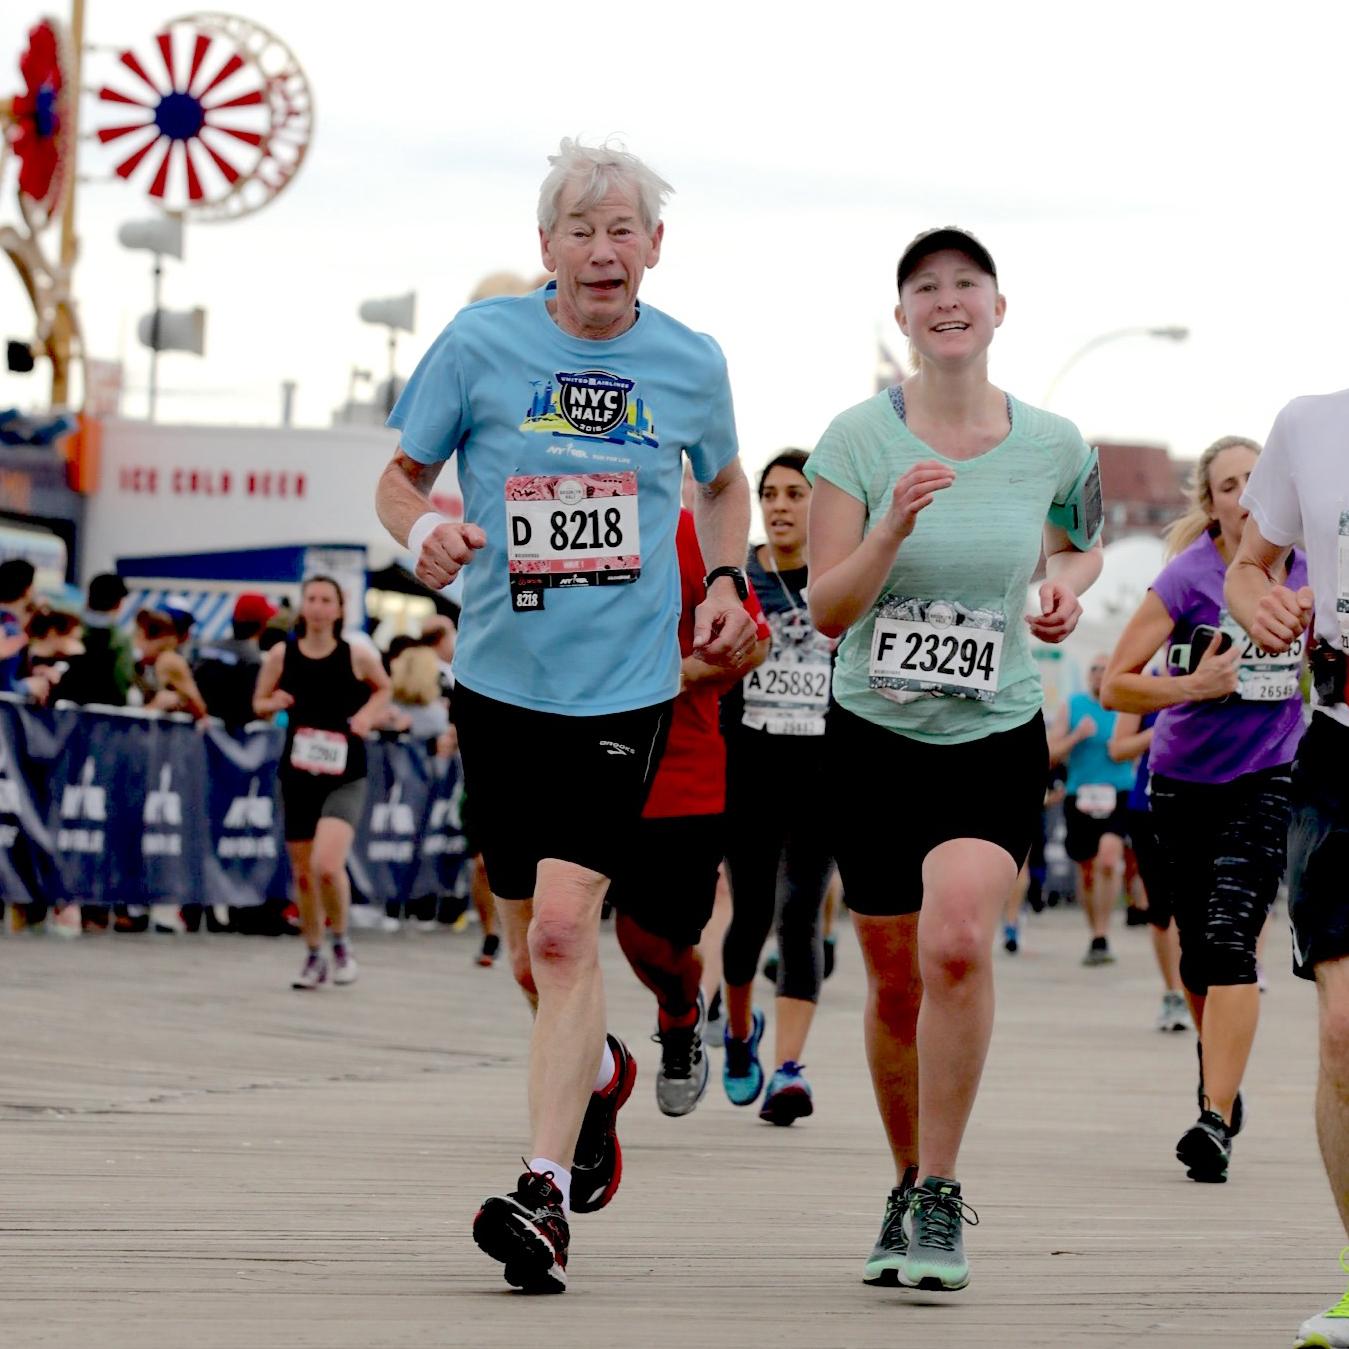 Runners on the Coney Island Boardwalk at the Brooklyn Half